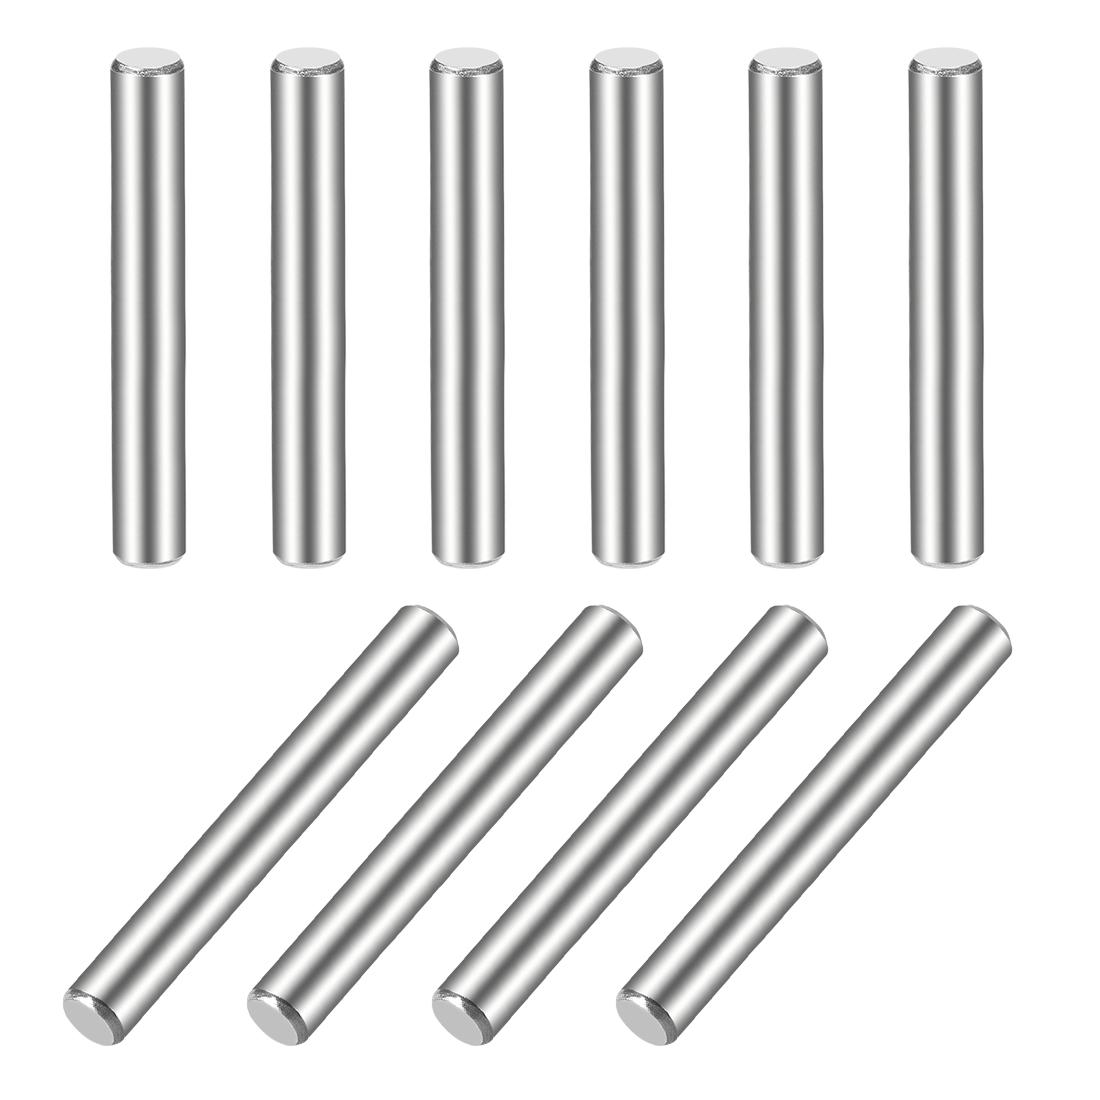 10Pcs 5mm x 50mm Dowel Pin 304 Stainless Steel Shelf Support Pin Fasten